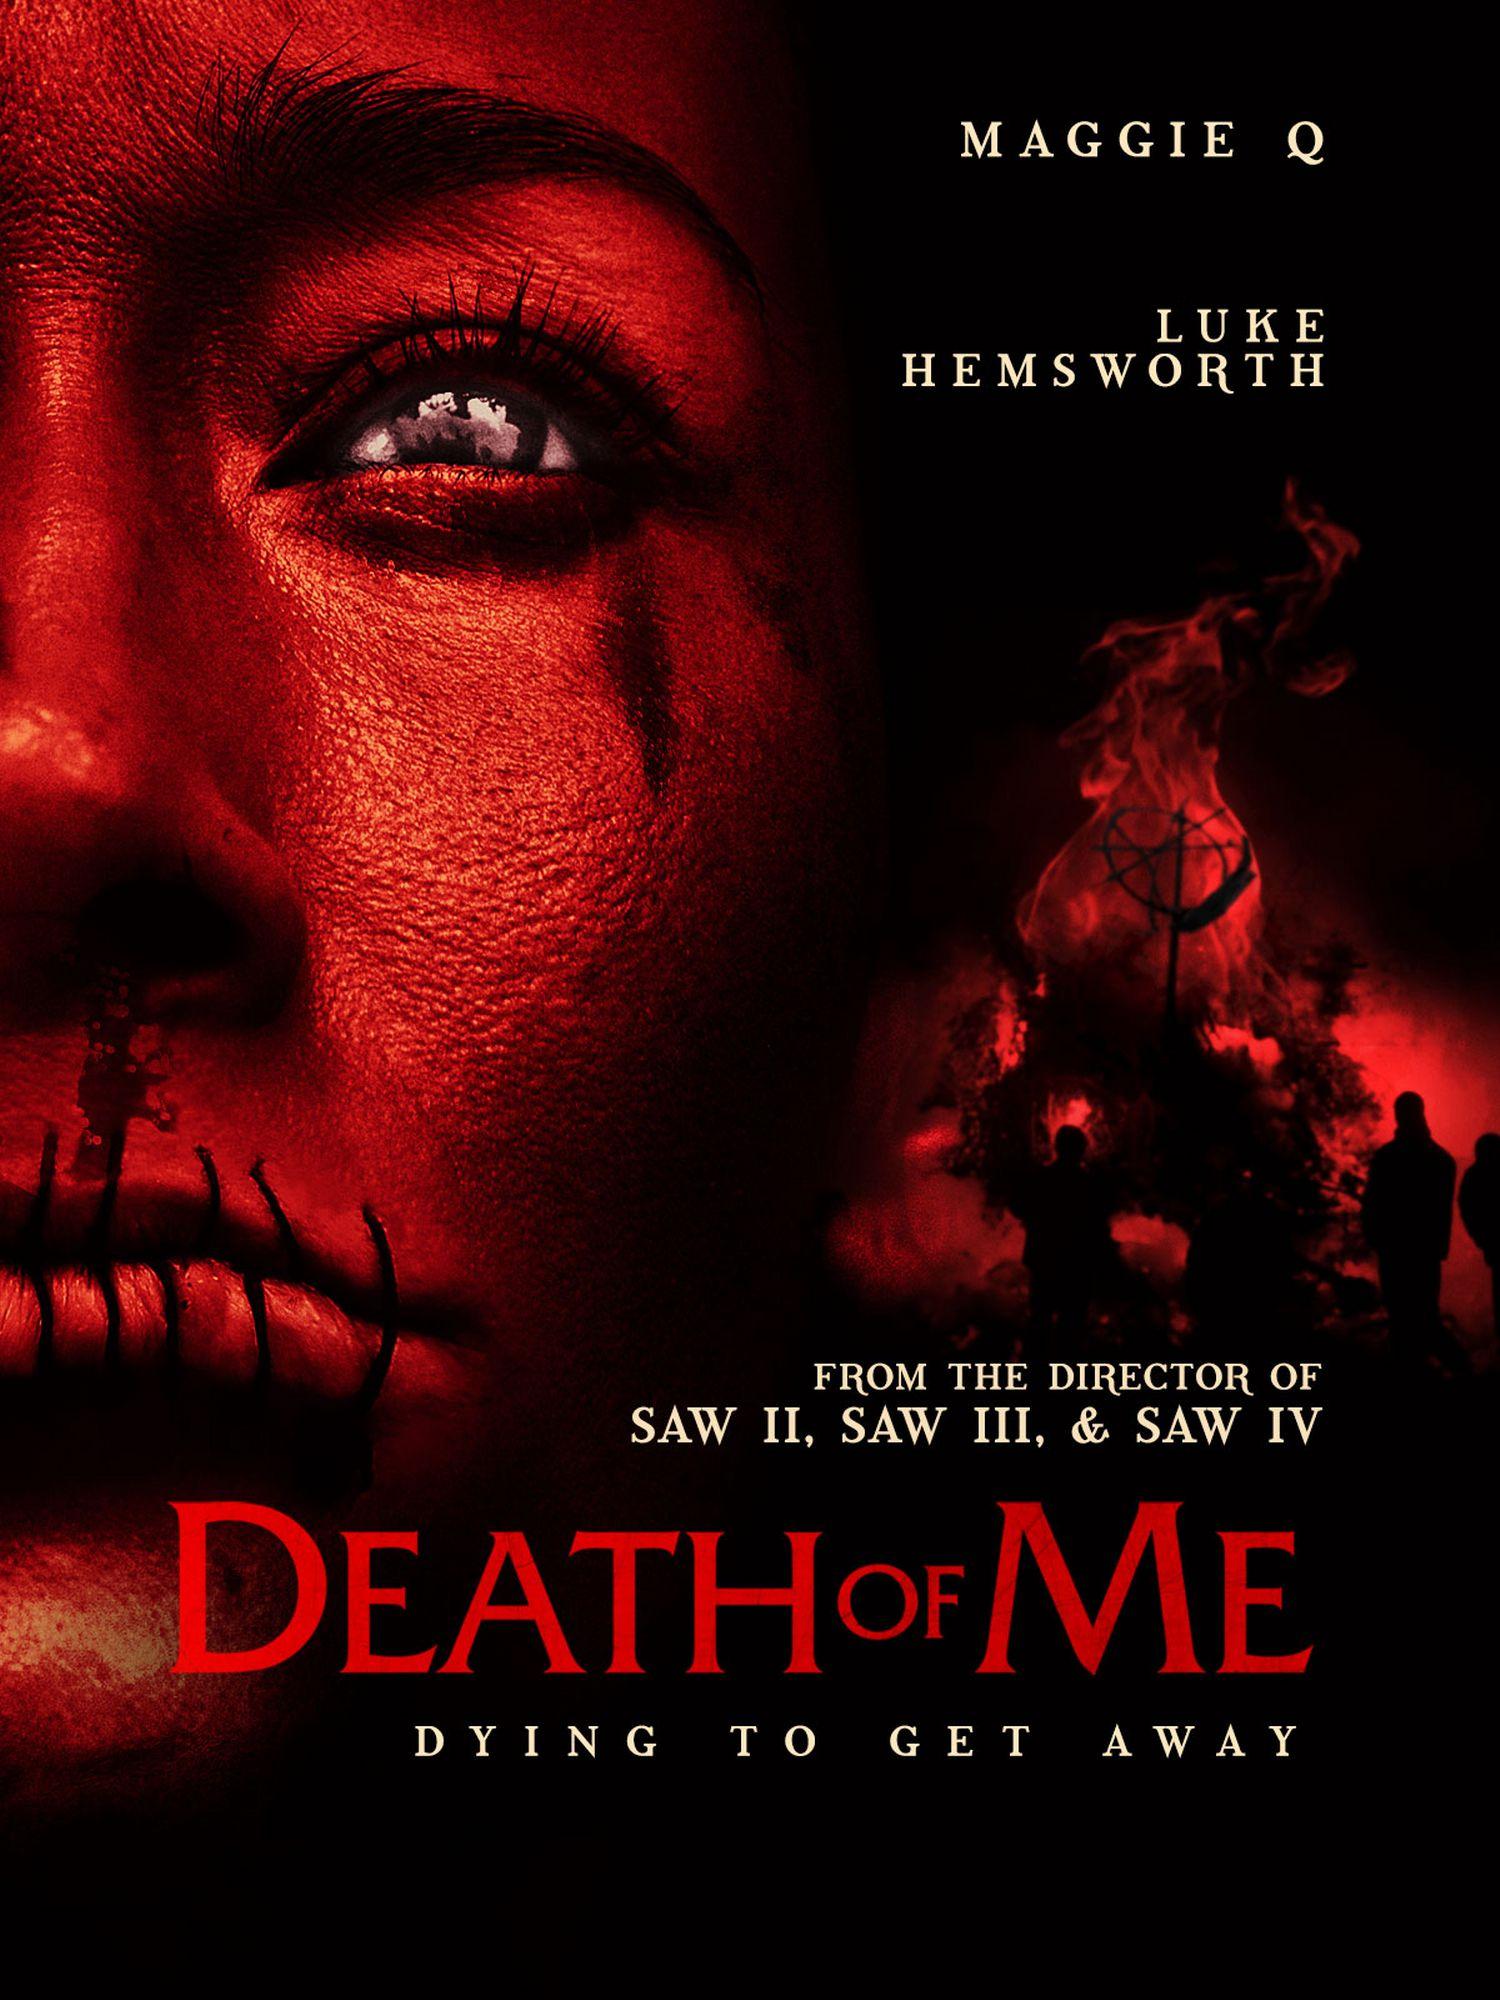 Death of Me (Signature Entertainment, 23rd November) Artwork